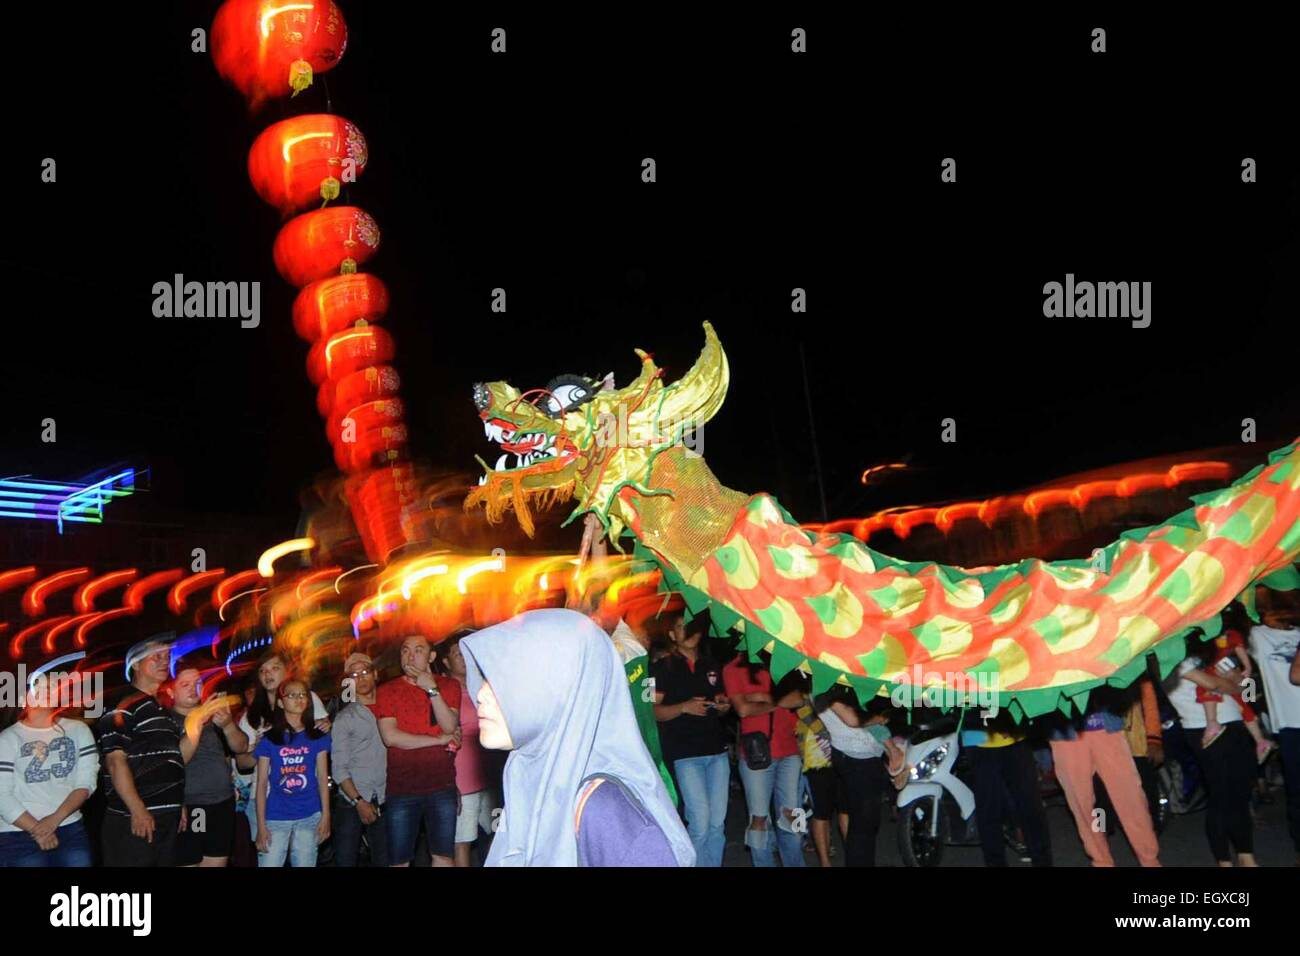 Singkawang, Indonesia. 03rd Mar, 2015.  People participate in the Lantern Festival in Singkawang, West Kalimantan, - Stock Image